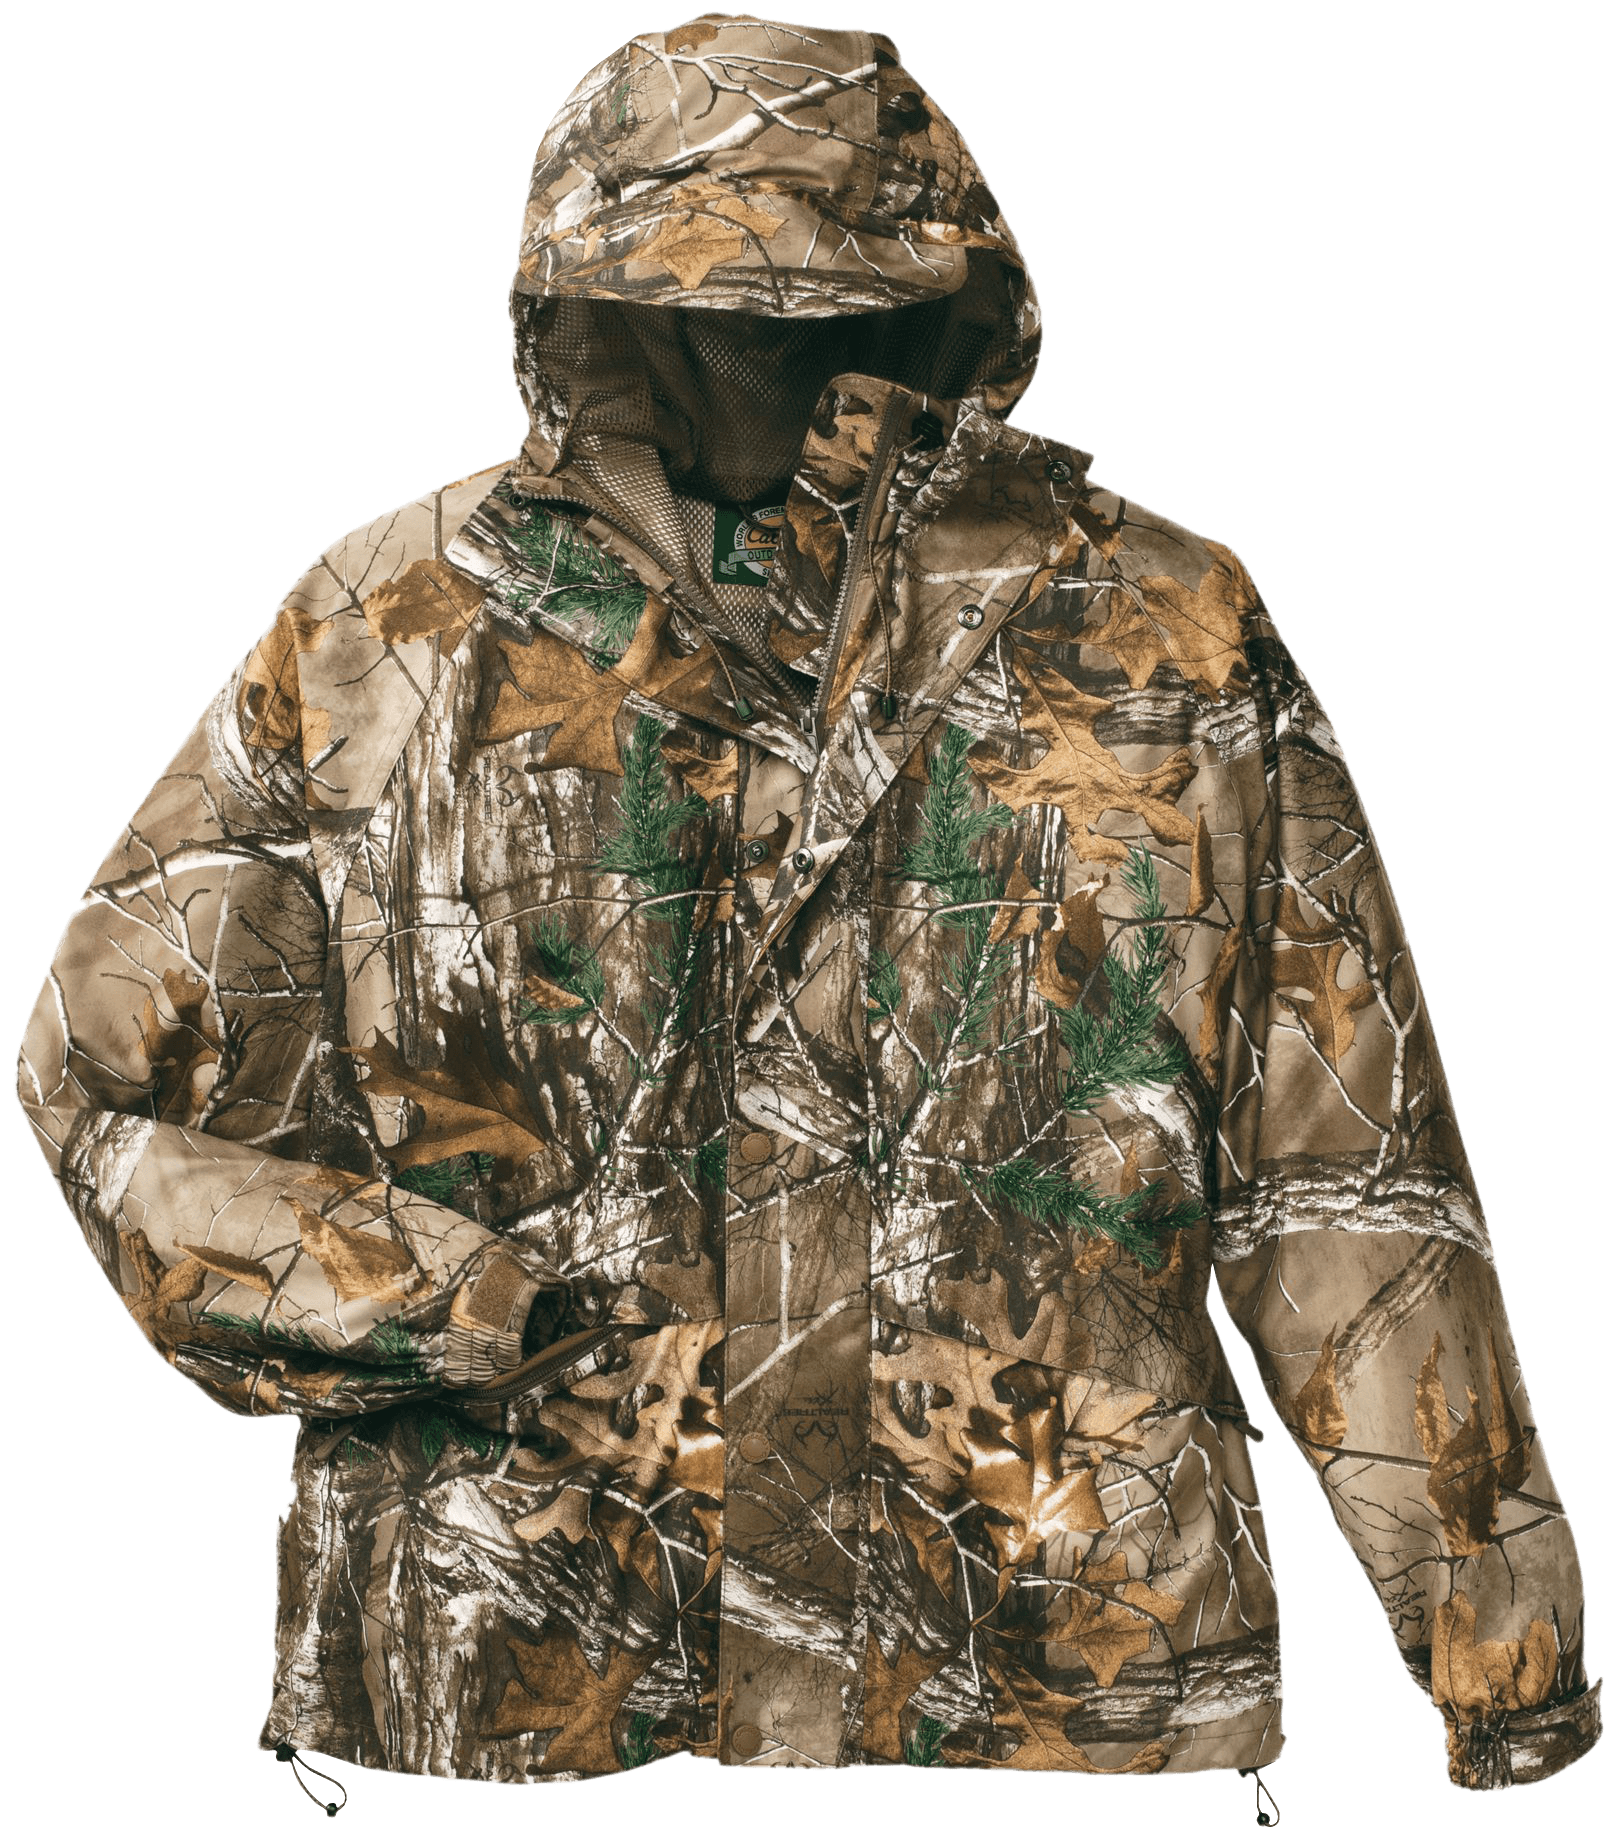 Men S Mt050 174 Quiet Pack Rain Jacket With Gore Tex Jackets Gore Tex Brand